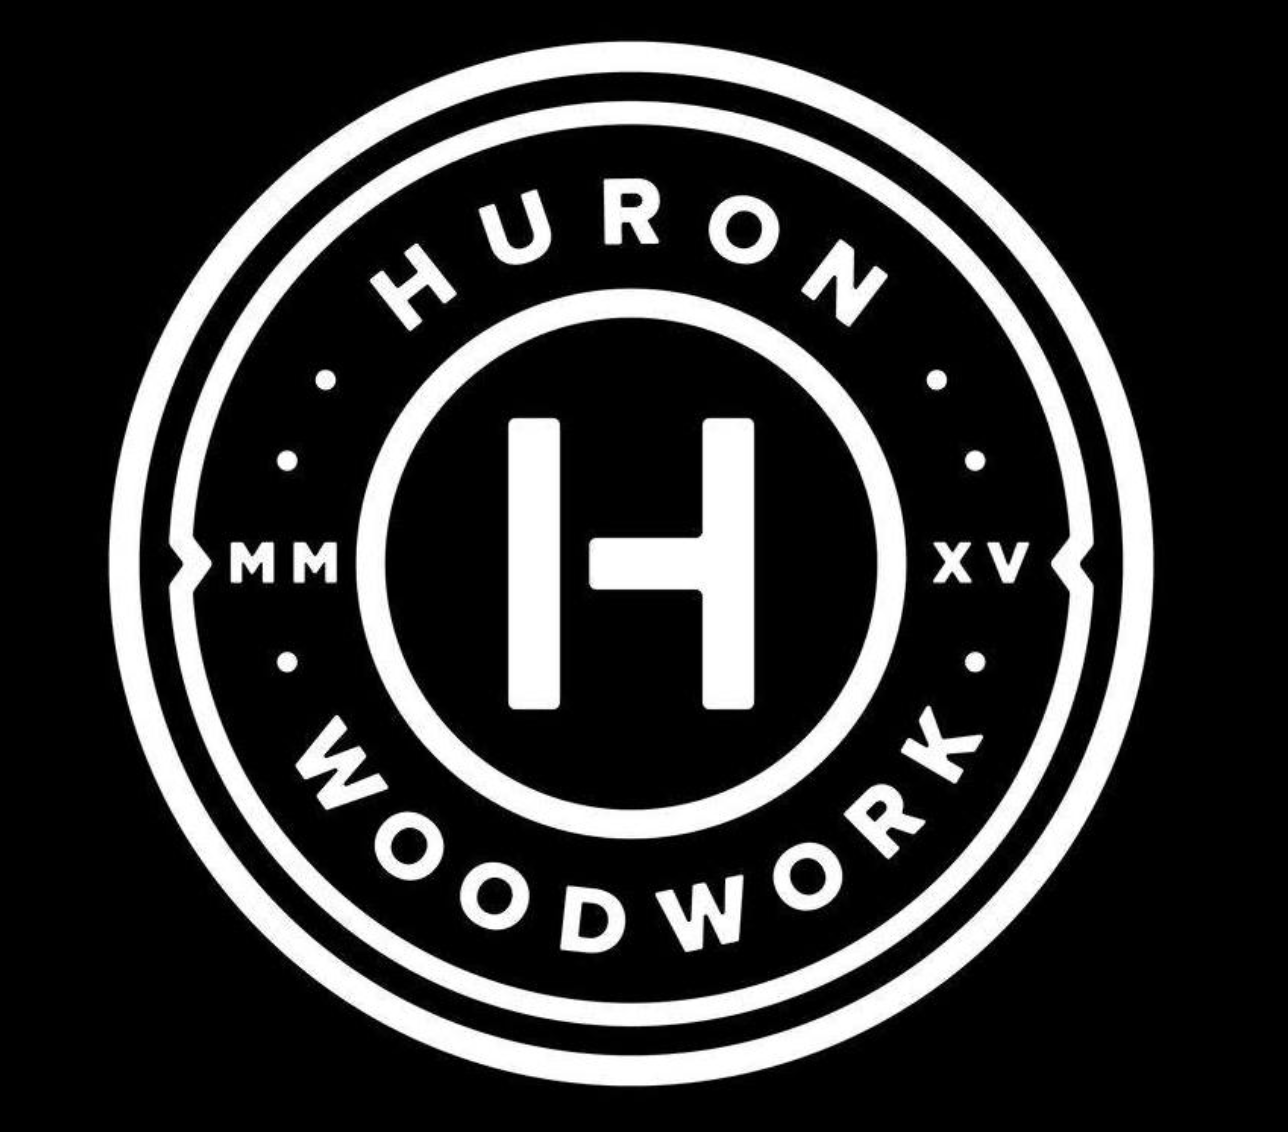 Huron Woodwork